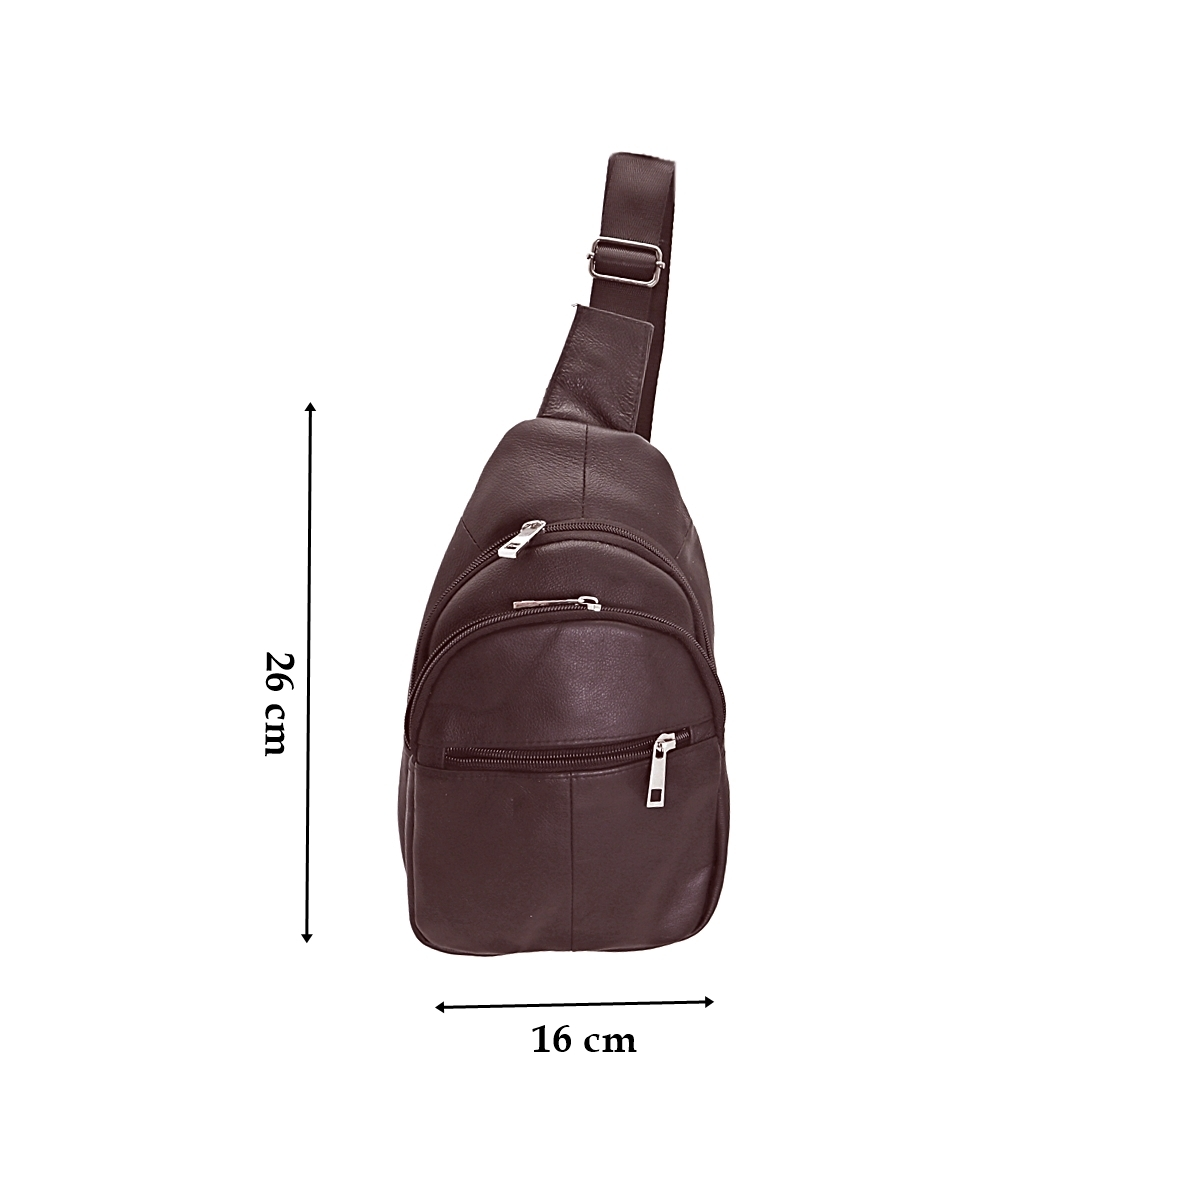 Borseta din piele naturala, bareta de umar, pe o parte, maro, 26/16, Magrot 025